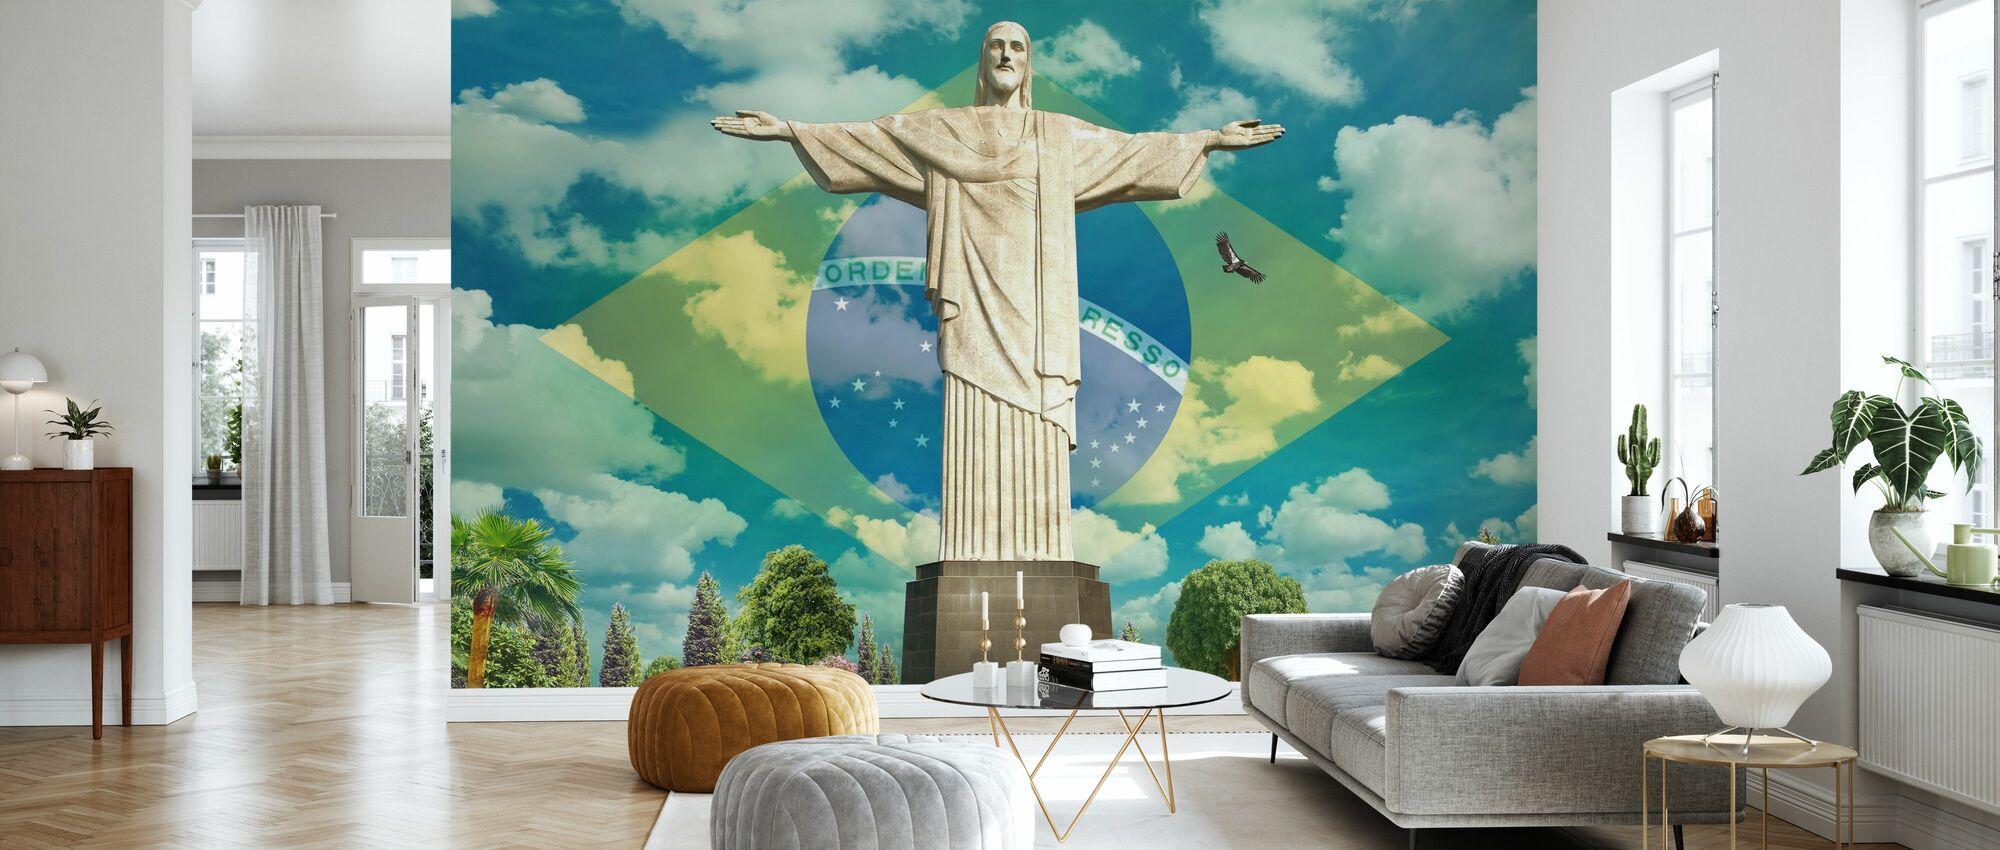 Jeesus Rio - Tapetti - Olohuone